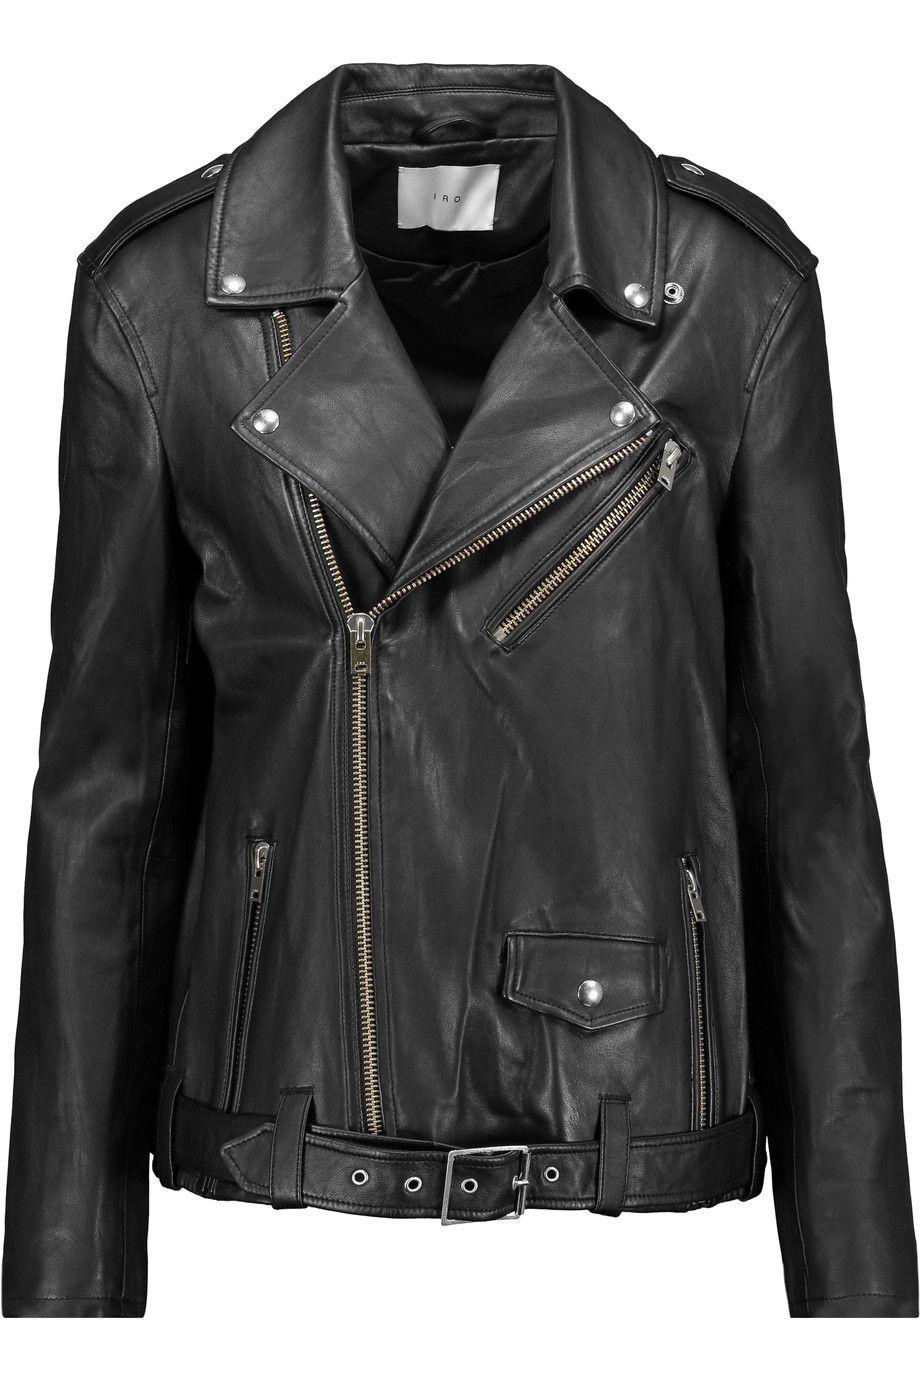 Iro Glippy Leather Biker Jacket Modesens Designer Jackets For Men Biker Jacket Jackets [ 1380 x 920 Pixel ]